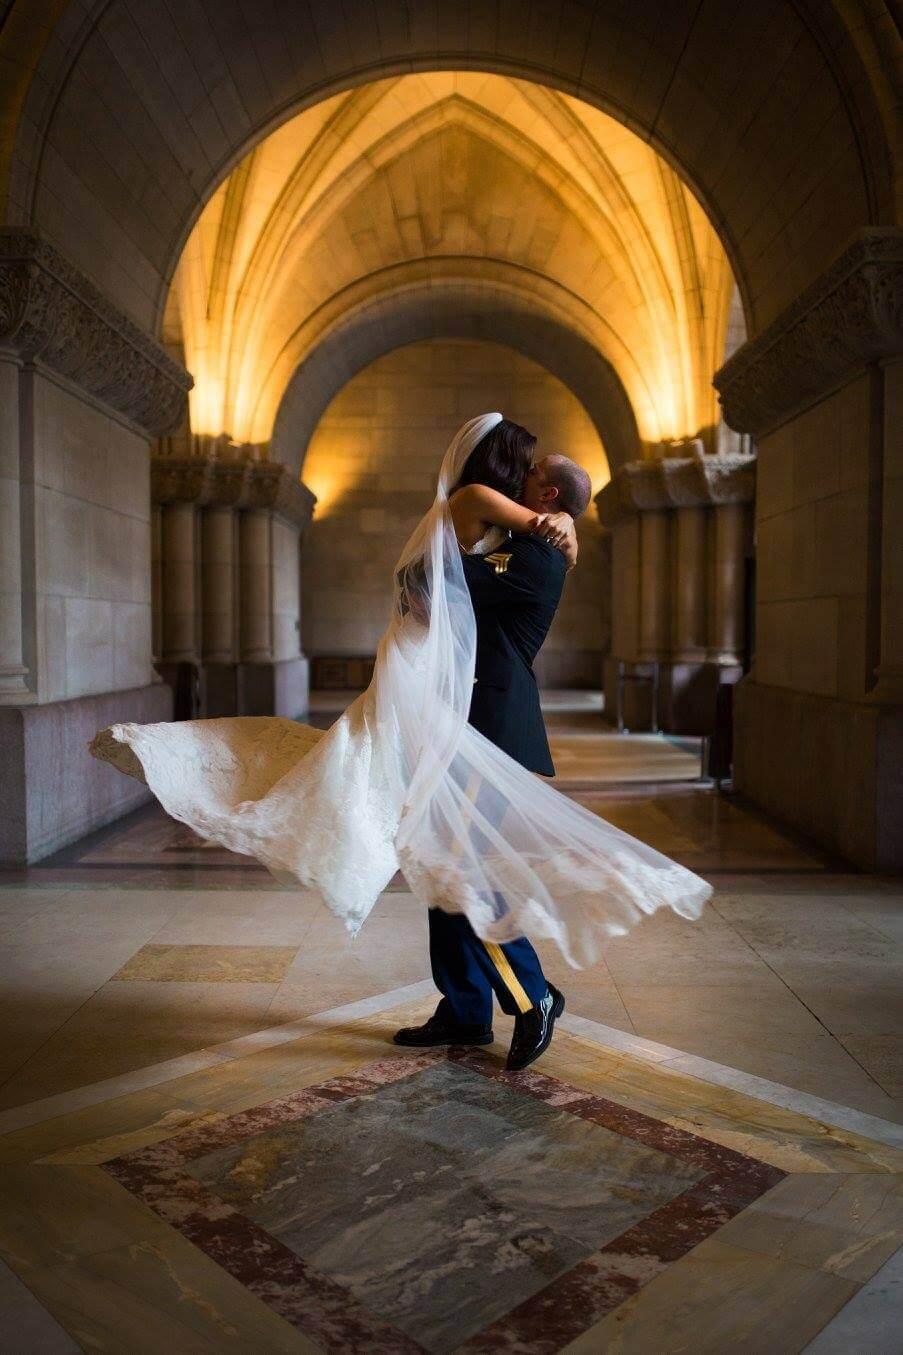 groom twirling his bride | Minnesota wedding photographer Studio KH wedding dress details | wedding blog | Sixpence Events 70 Ways to Photograph Your Wedding Dress.jpg